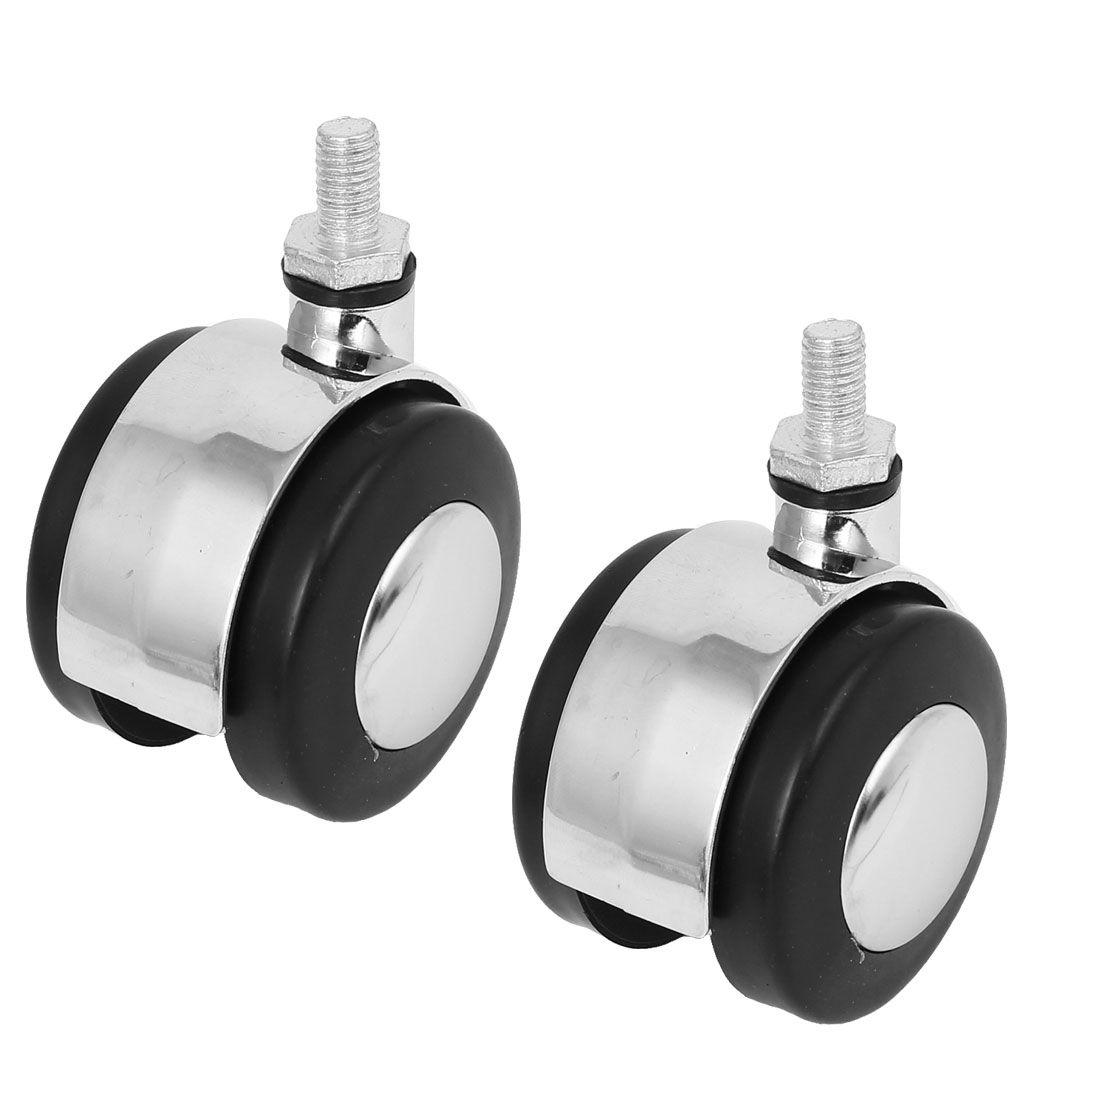 "$8.60 (Buy here: https://alitems.com/g/1e8d114494ebda23ff8b16525dc3e8/?i=5&ulp=https%3A%2F%2Fwww.aliexpress.com%2Fitem%2FUXCELL-M8-X-14Mm-2-Dia-Threaded-Stem-Brake-Universal-Swivel-Caster-Twin-Wheel-2Pcs%2F32787066422.html ) UXCELL M8 X 14Mm 2"" Dia Threaded Stem Brake Universal Swivel Caster Twin Wheel 2Pcs for just $8.60"